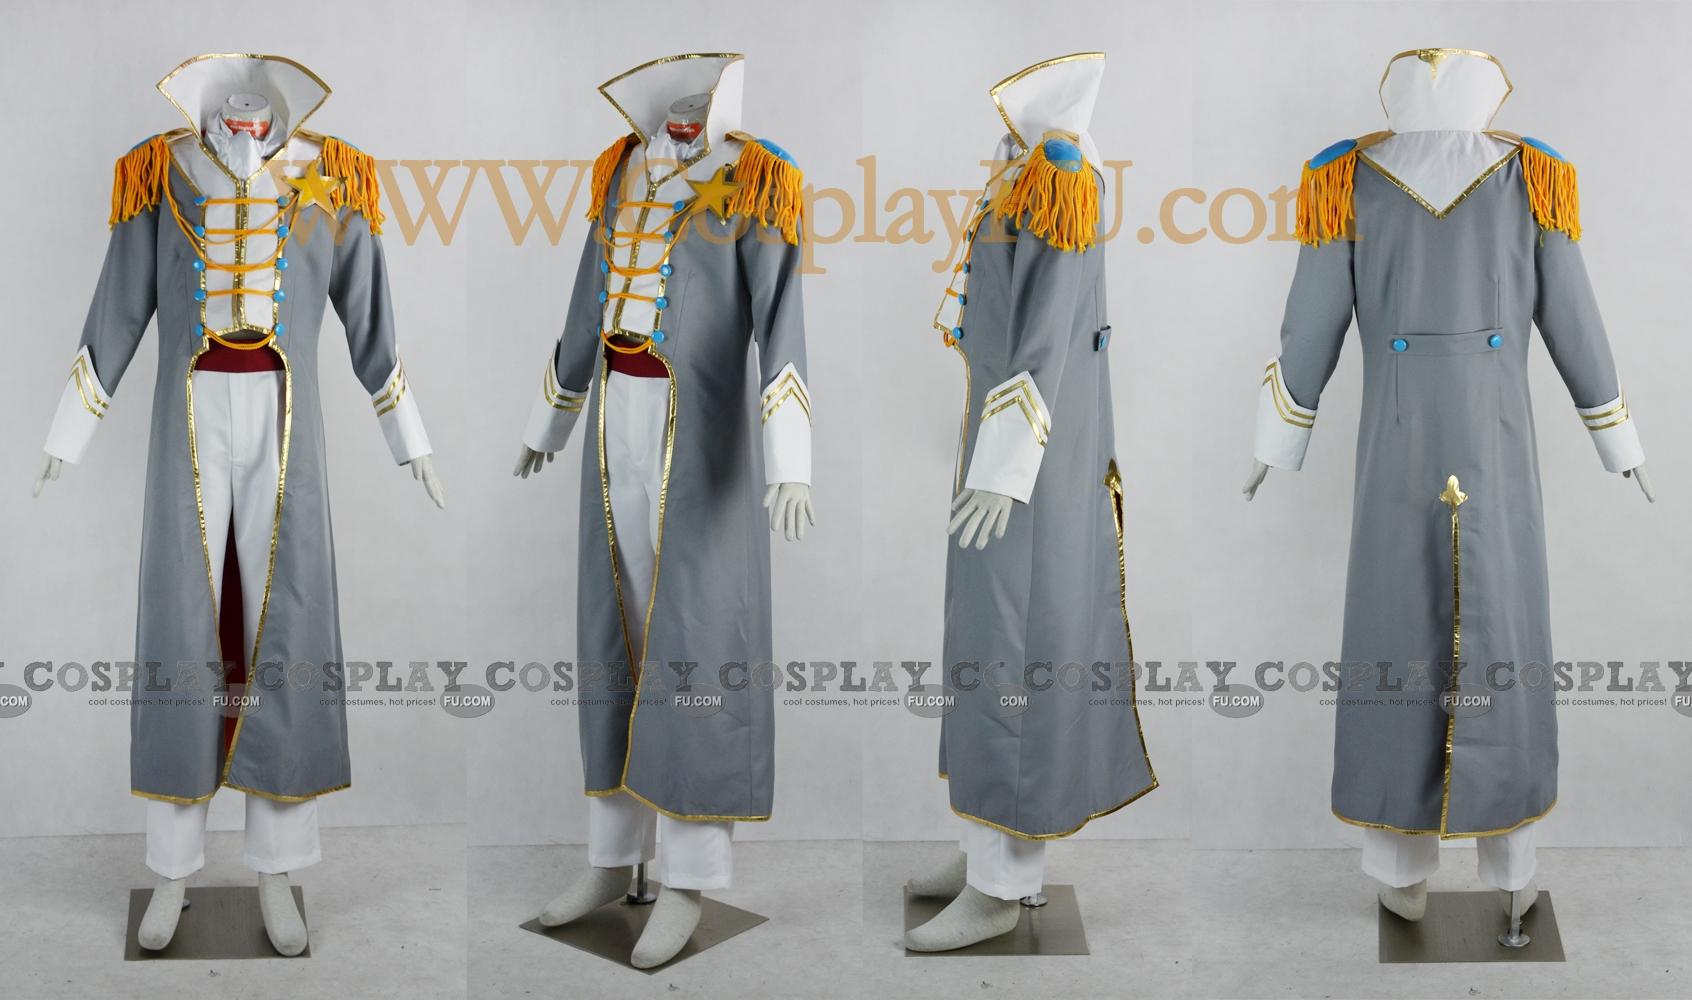 Takuto Cosplay Costume (Cybody Taubarn) from Star Driver